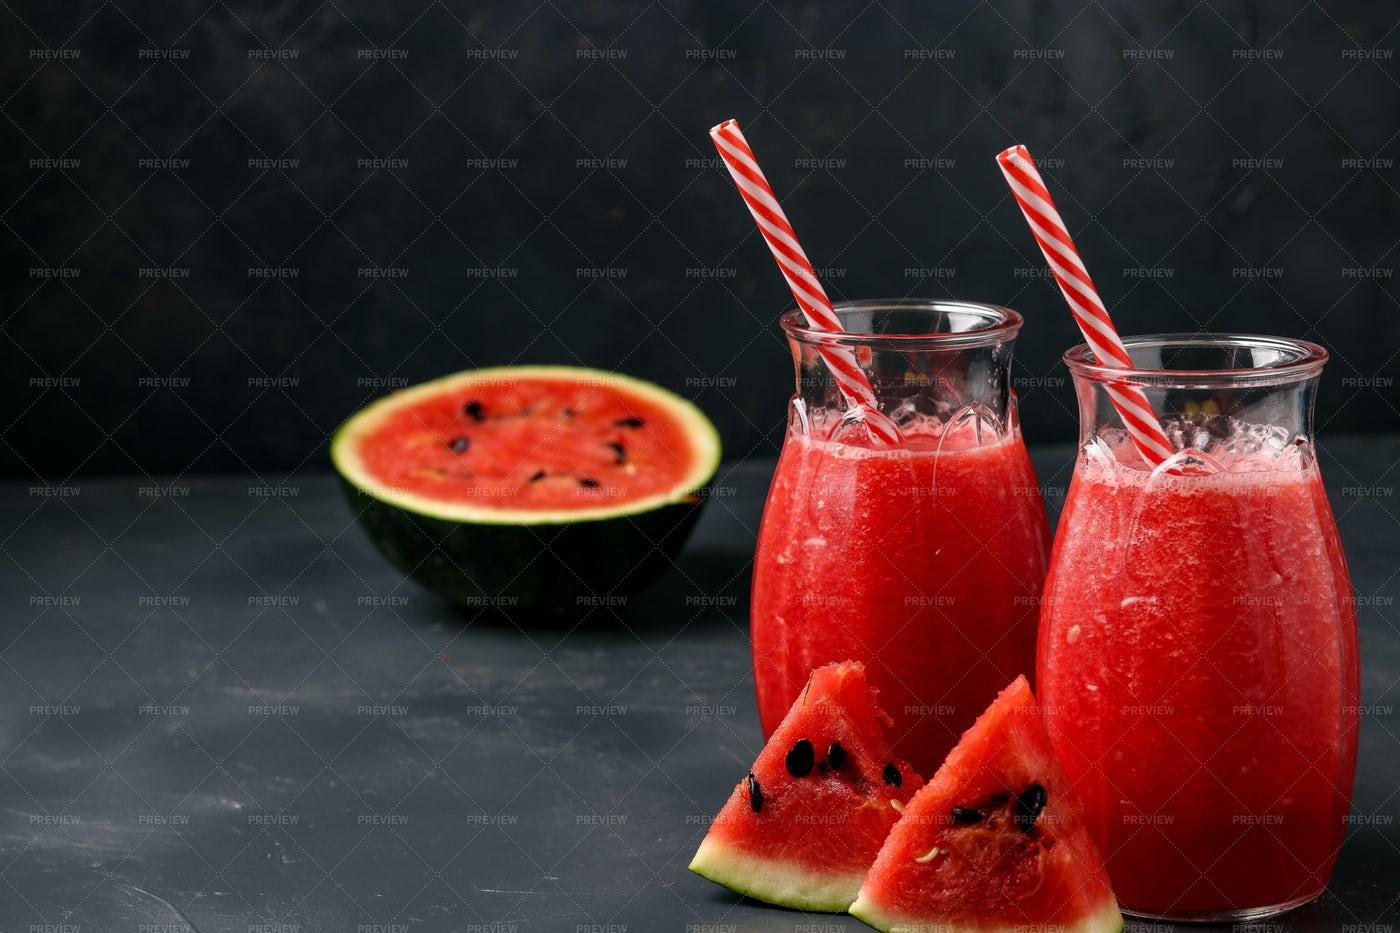 Watermelon Juice In Jars: Stock Photos